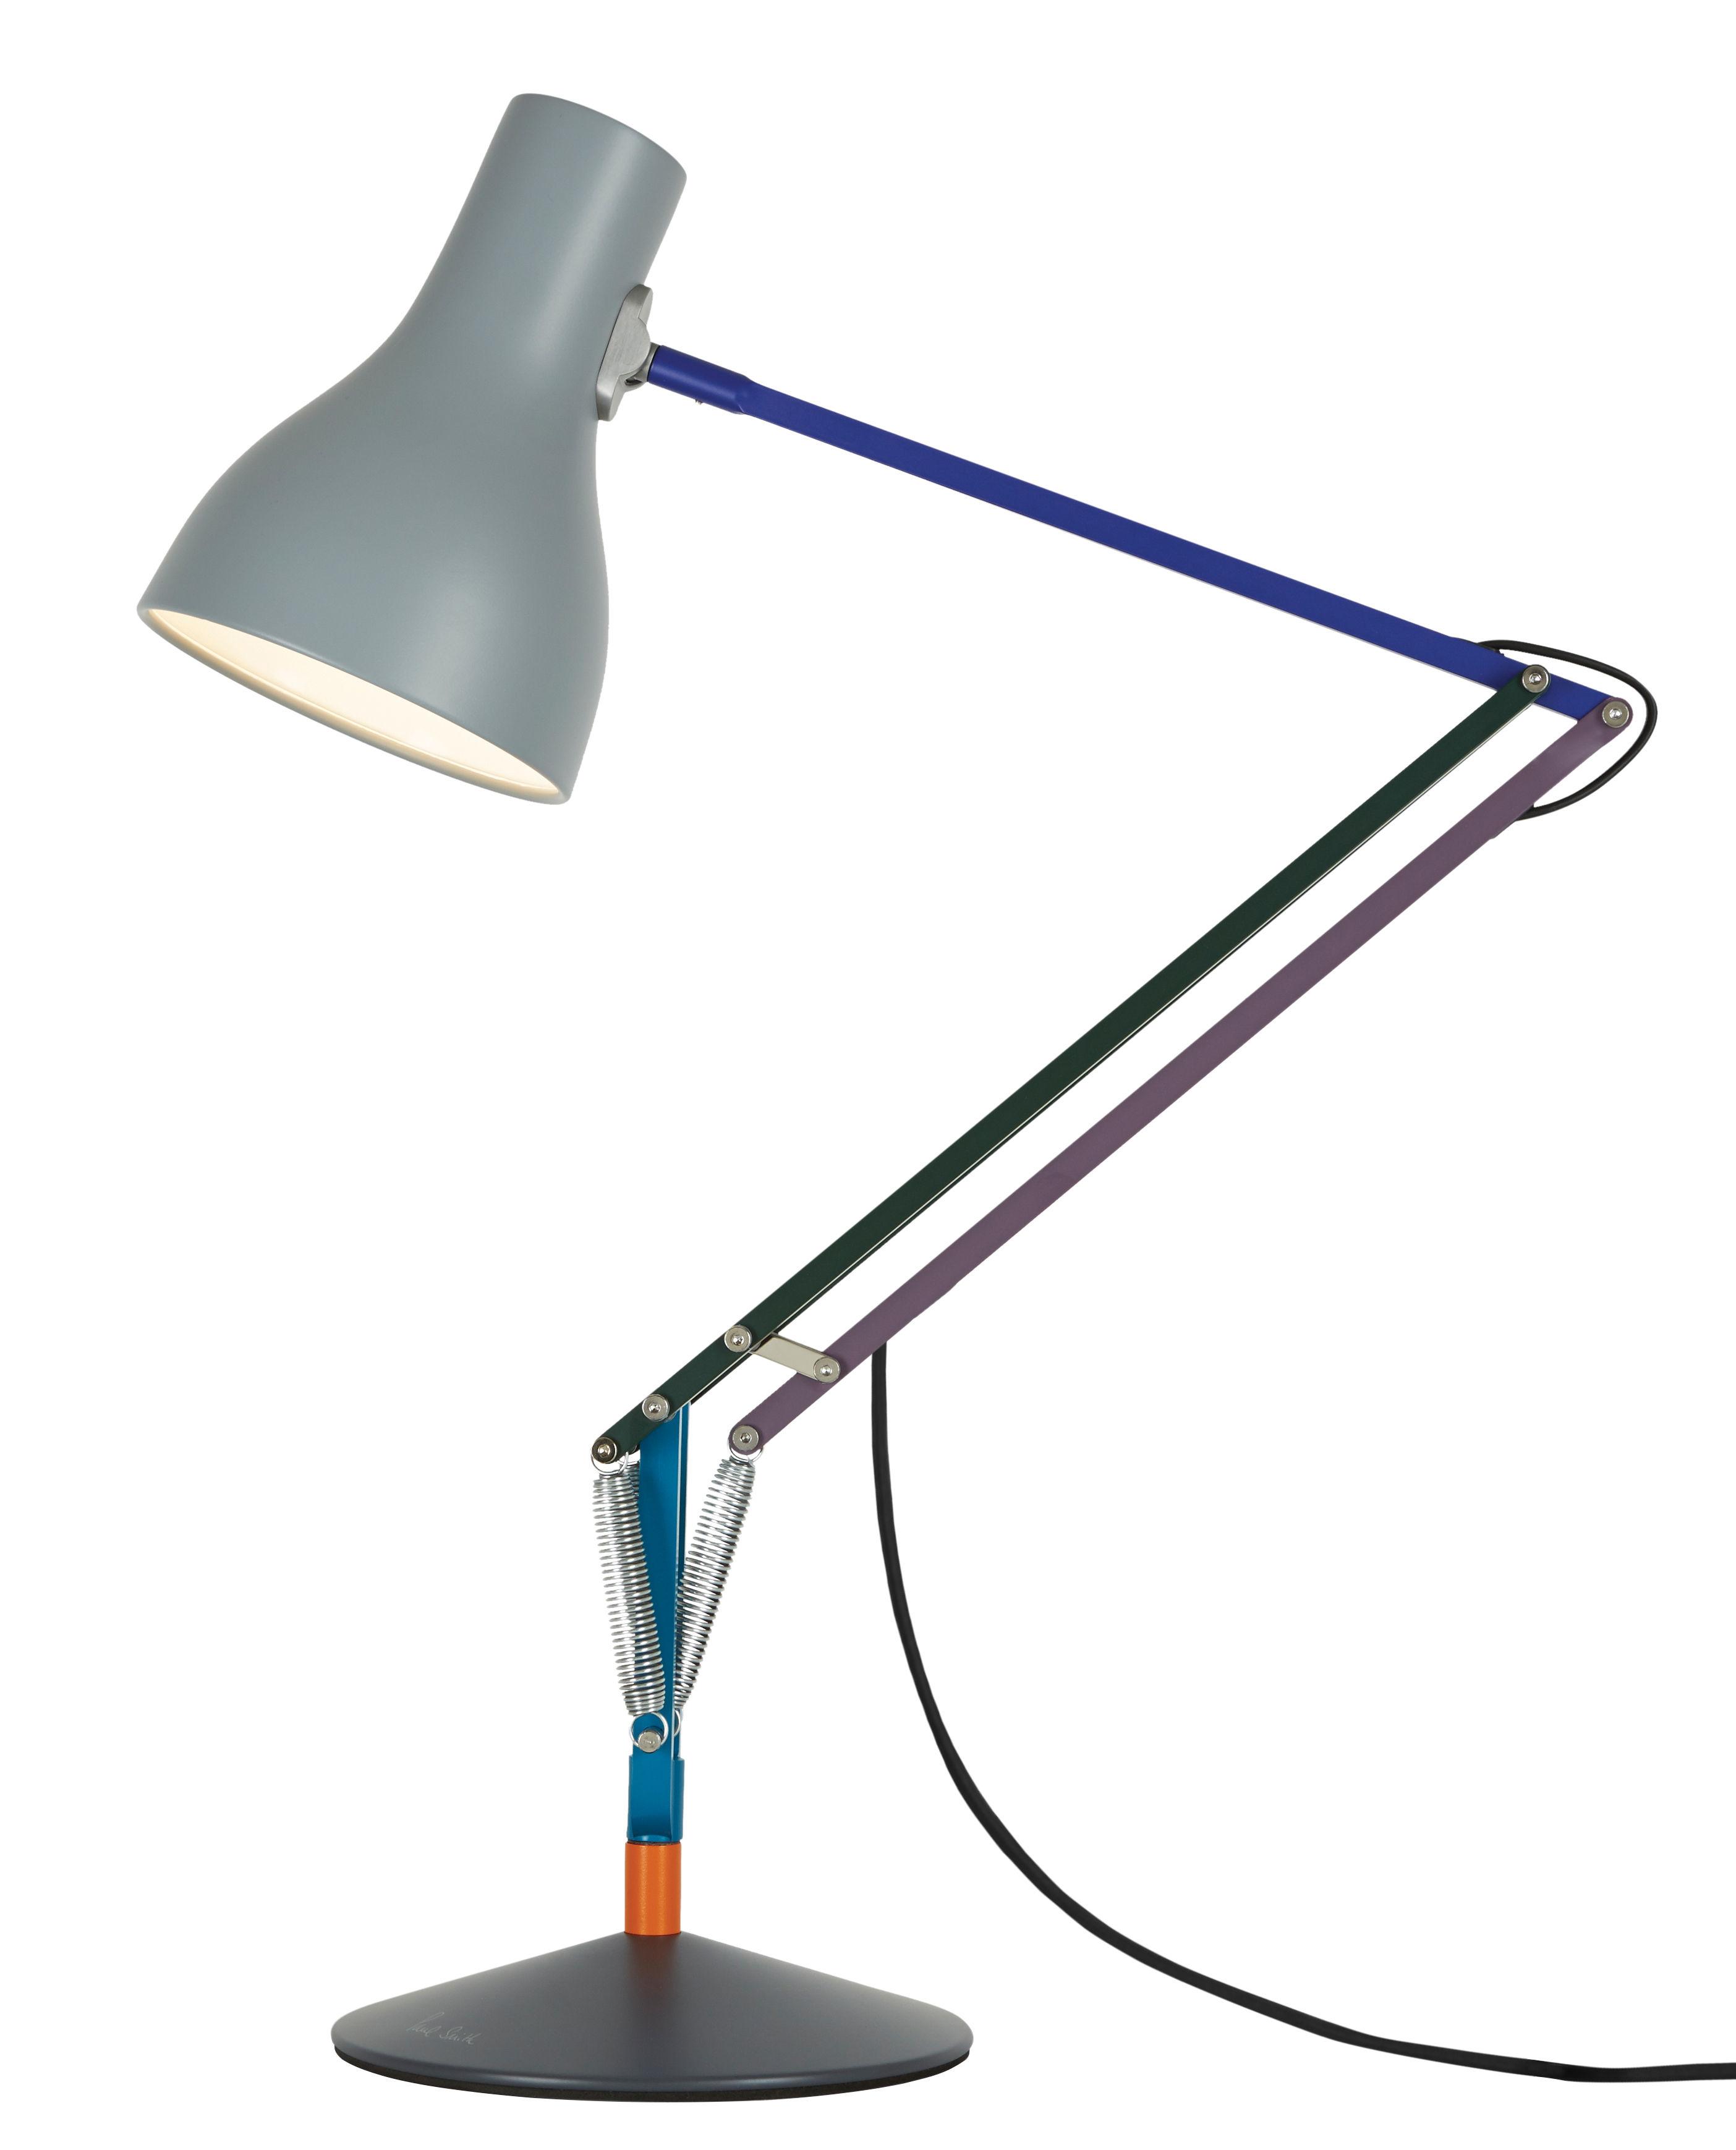 Luminaire - Lampes de table - Lampe de table Type 75 / By Paul Smith - Edition n°2 - Anglepoise - Bleu, Violet, Vert, Bleu - Aluminium